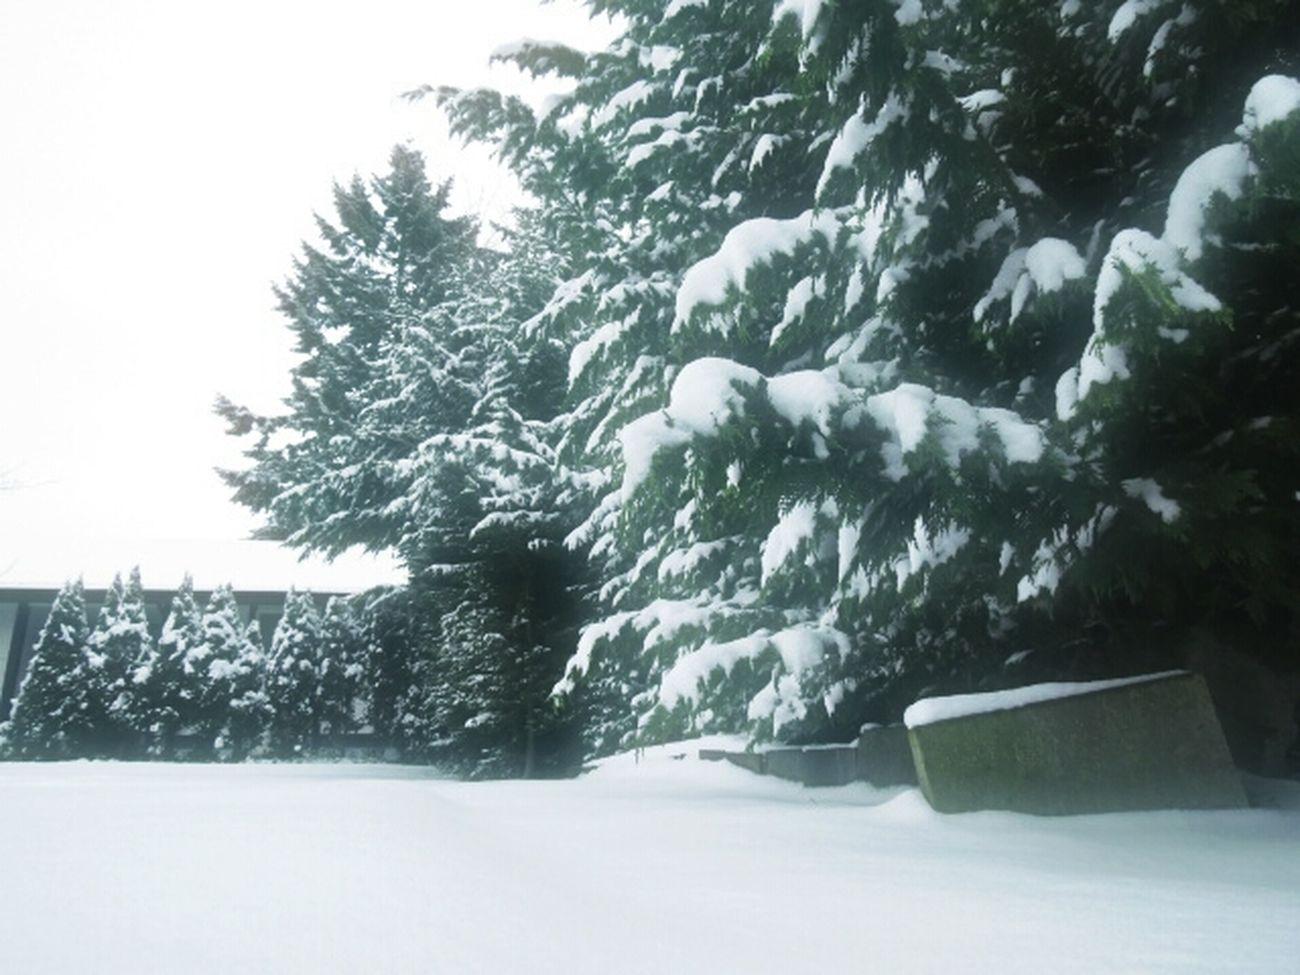 Winter Wonderland Snow Trees Snow Winter Landscape